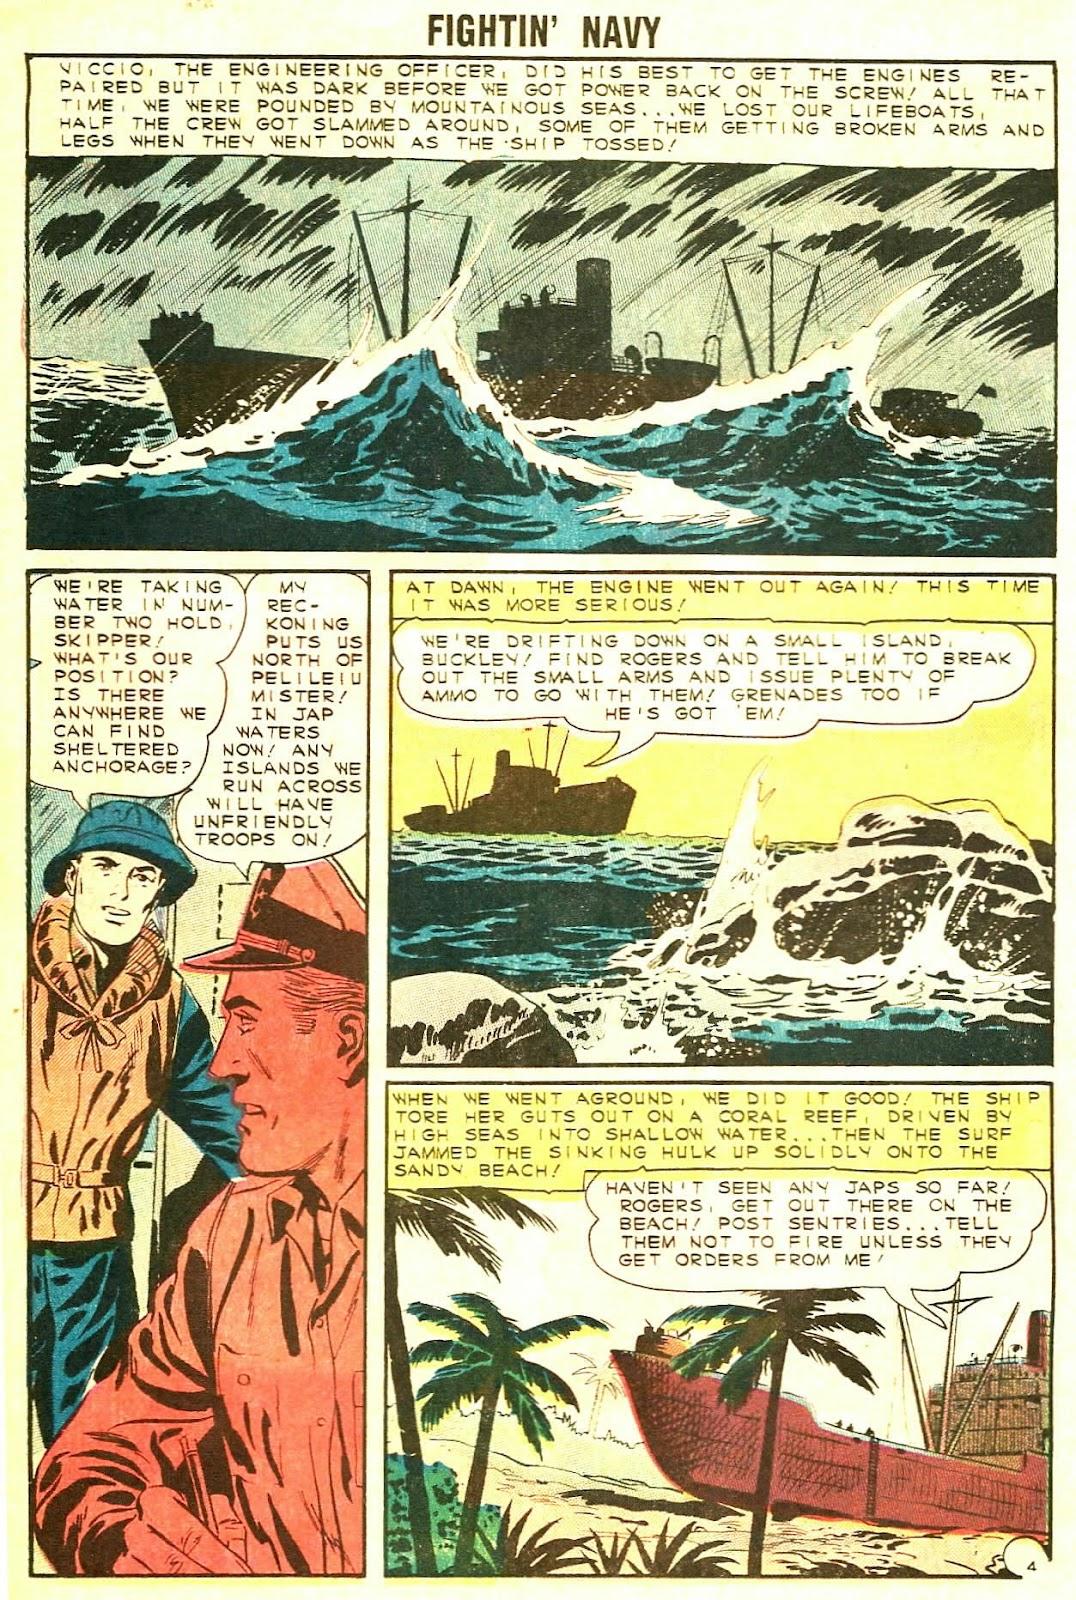 Read online Fightin' Navy comic -  Issue #117 - 18